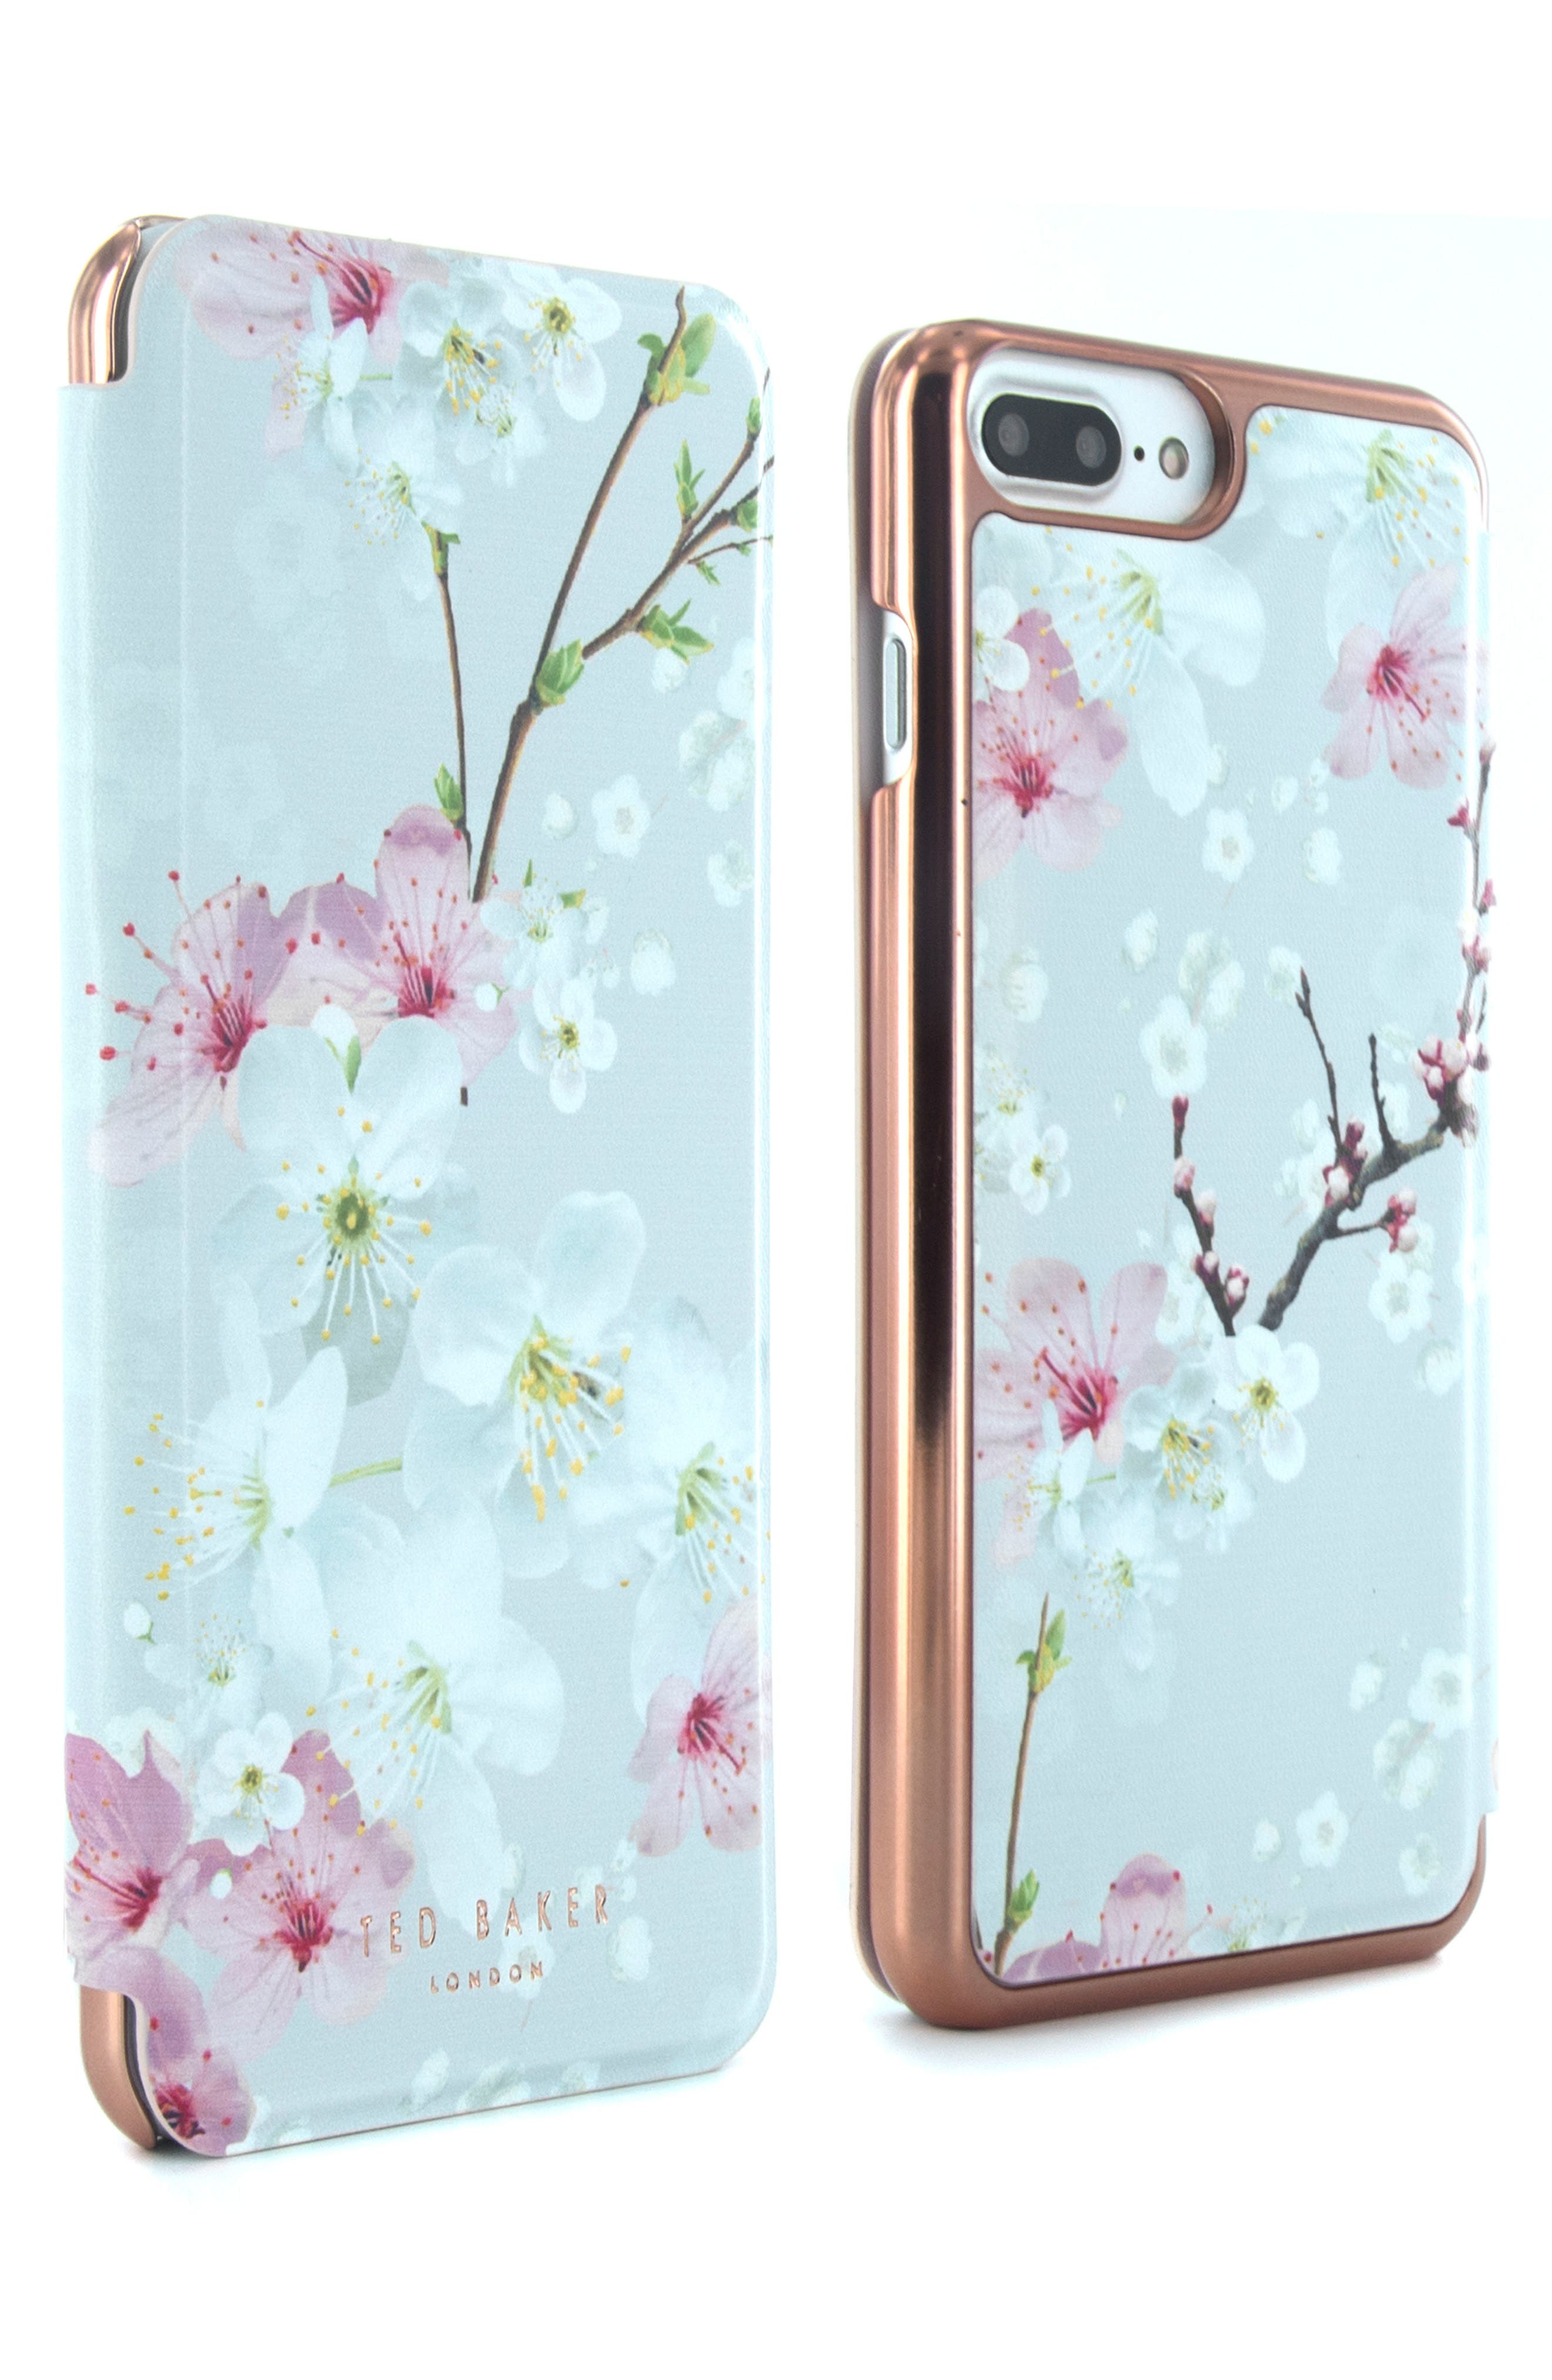 TED BAKER LONDON Mirror iPhone 6/7 Plus Folio Case